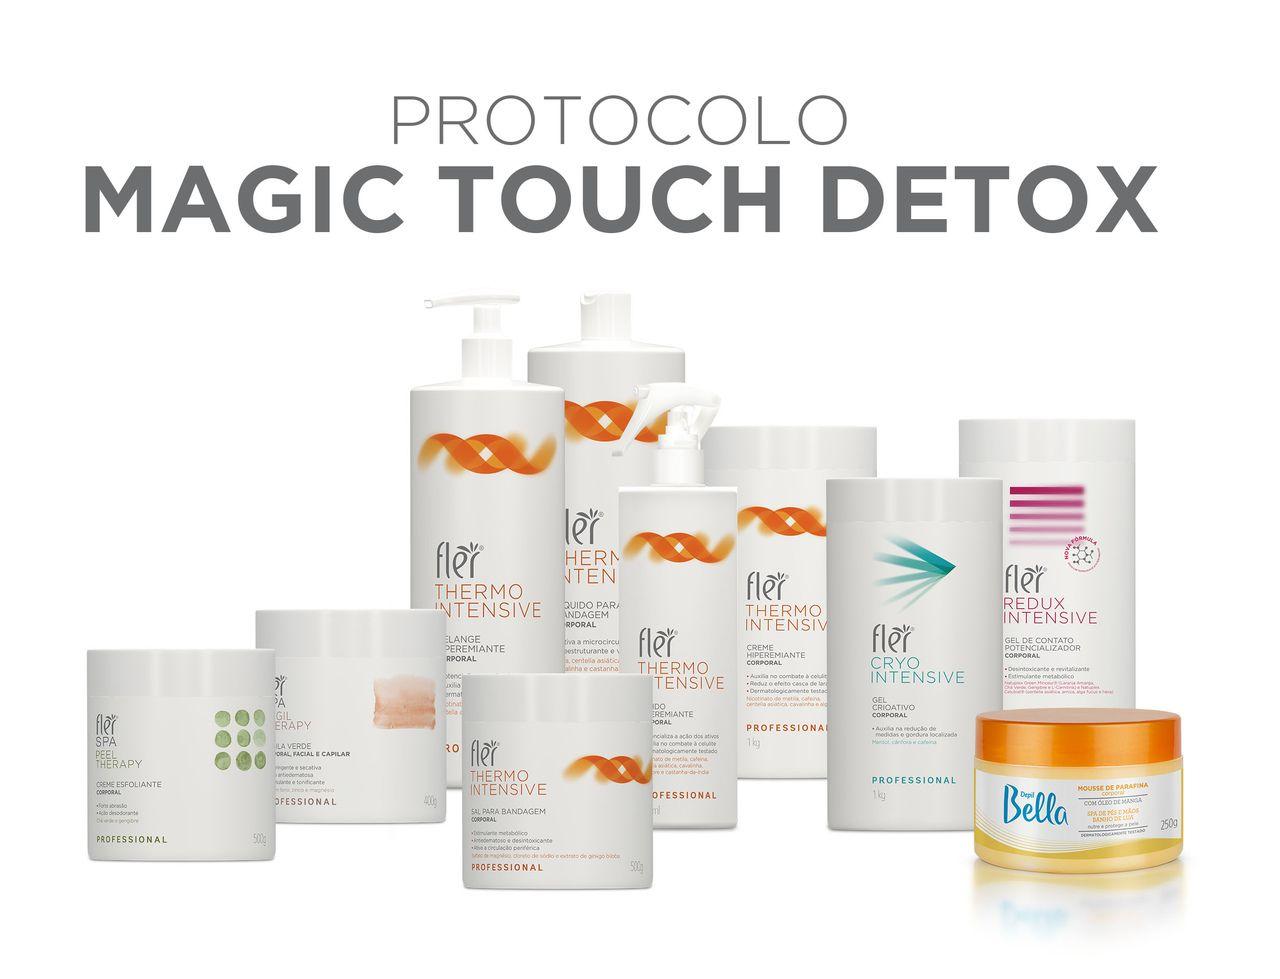 Kit Magic Touch Detox by Flávia Medeiros